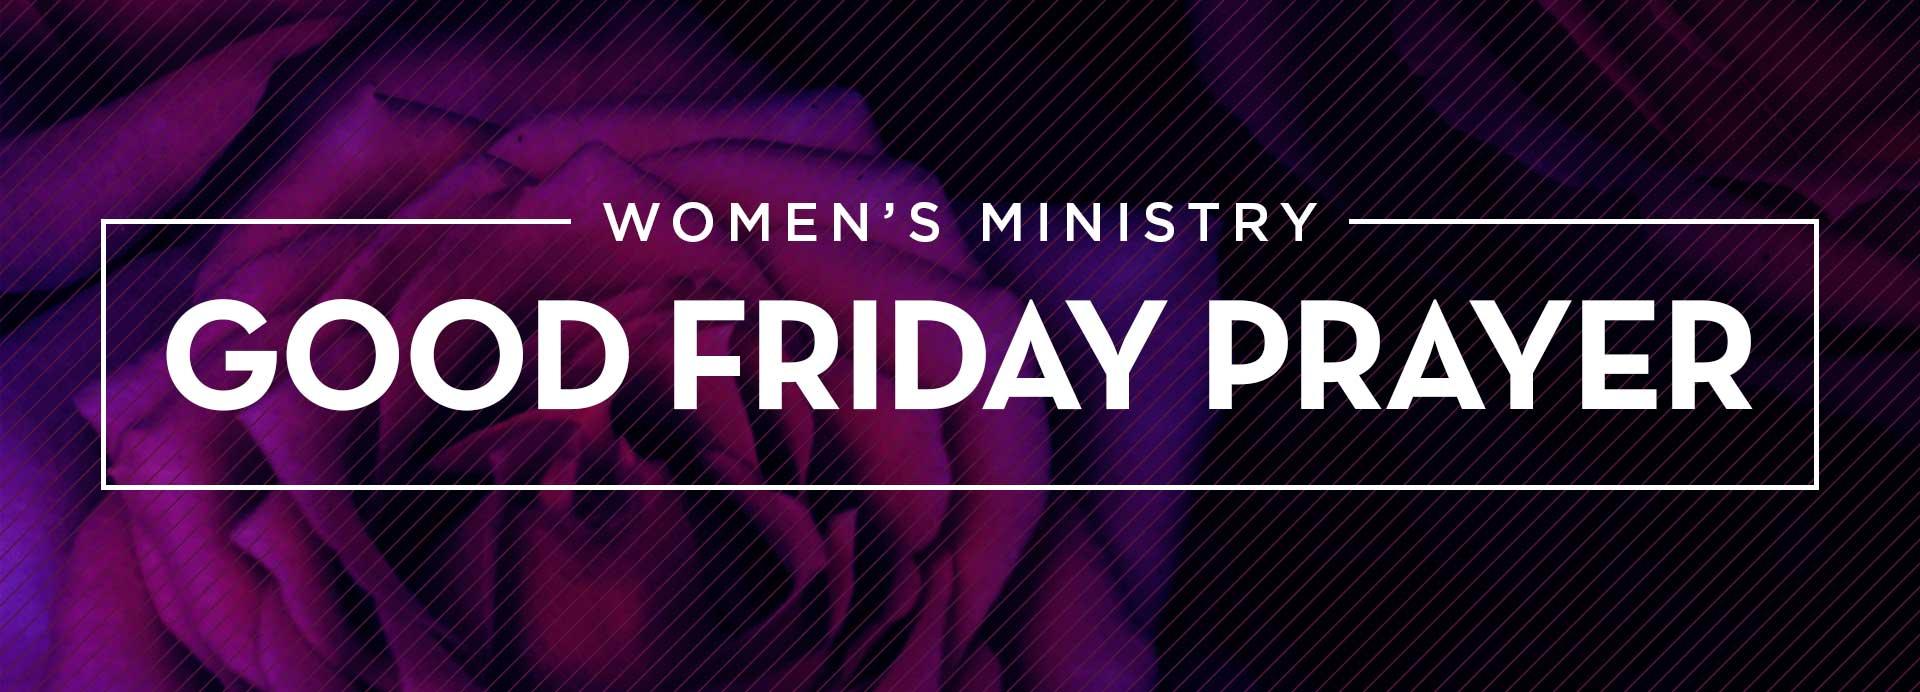 Women's-GF-Prayer_1920x692_v1.jpg